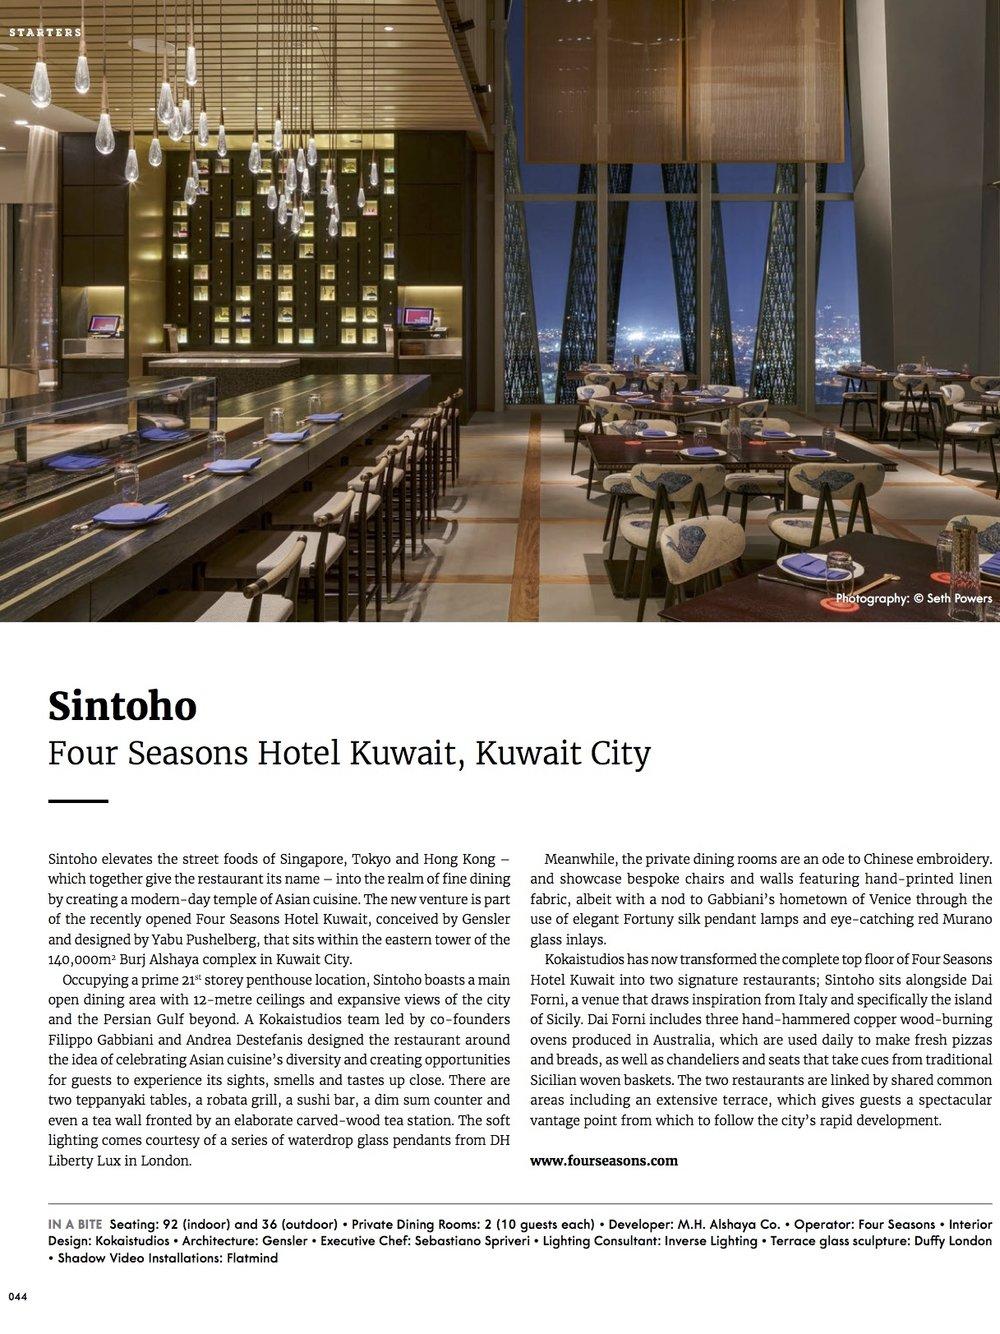 Supper | Issue 11 July 2018 - Sintoho at Four Seasons Hotel Kuwait |Kokaistudios